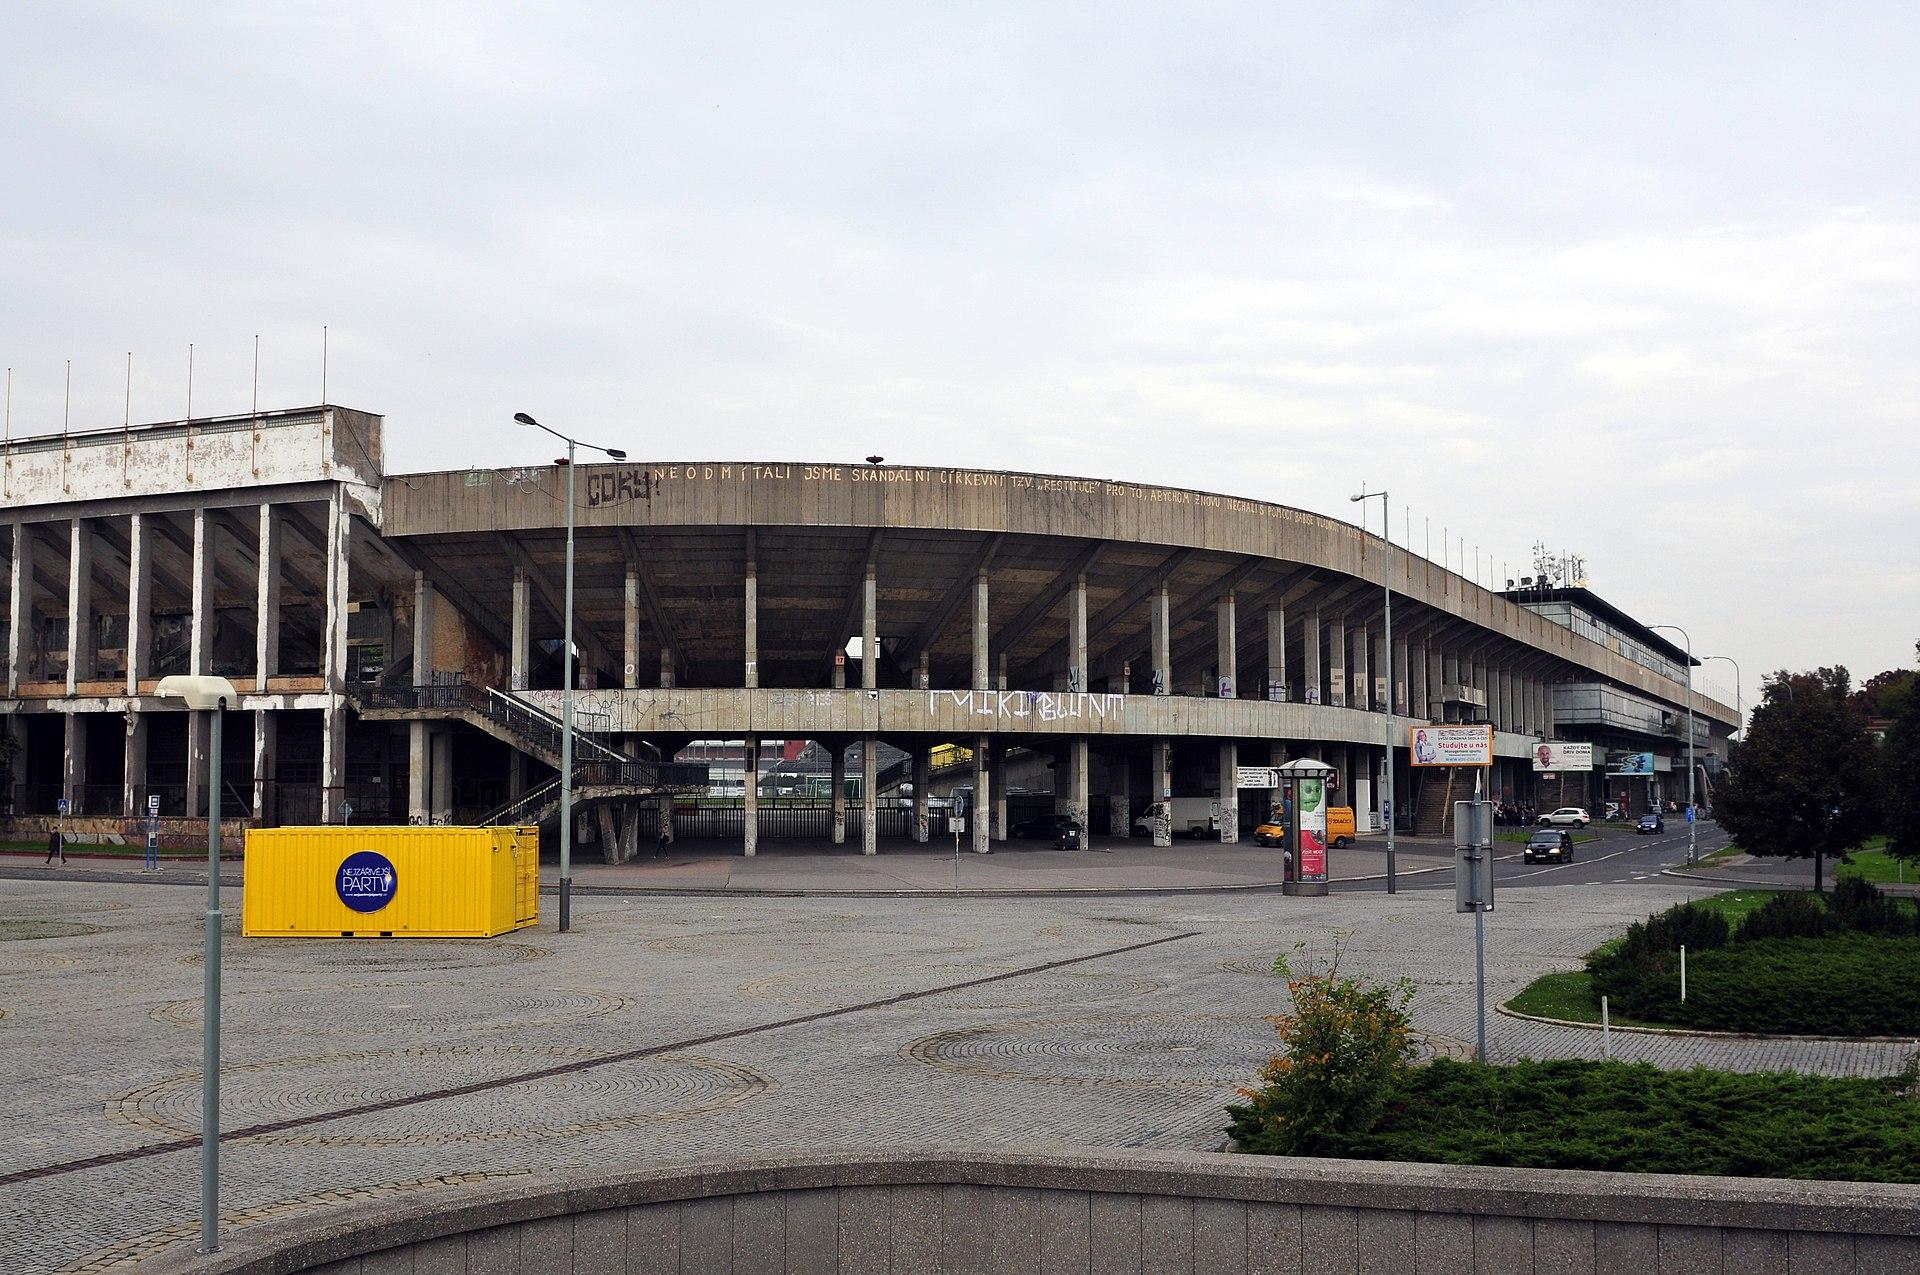 https://upload.wikimedia.org/wikipedia/commons/thumb/8/87/14-09-30-Velk%C3%BD-strahovsk%C3%BD-stadion-RalfR-007.jpg/1920px-14-09-30-Velk%C3%BD-strahovsk%C3%BD-stadion-RalfR-007.jpg